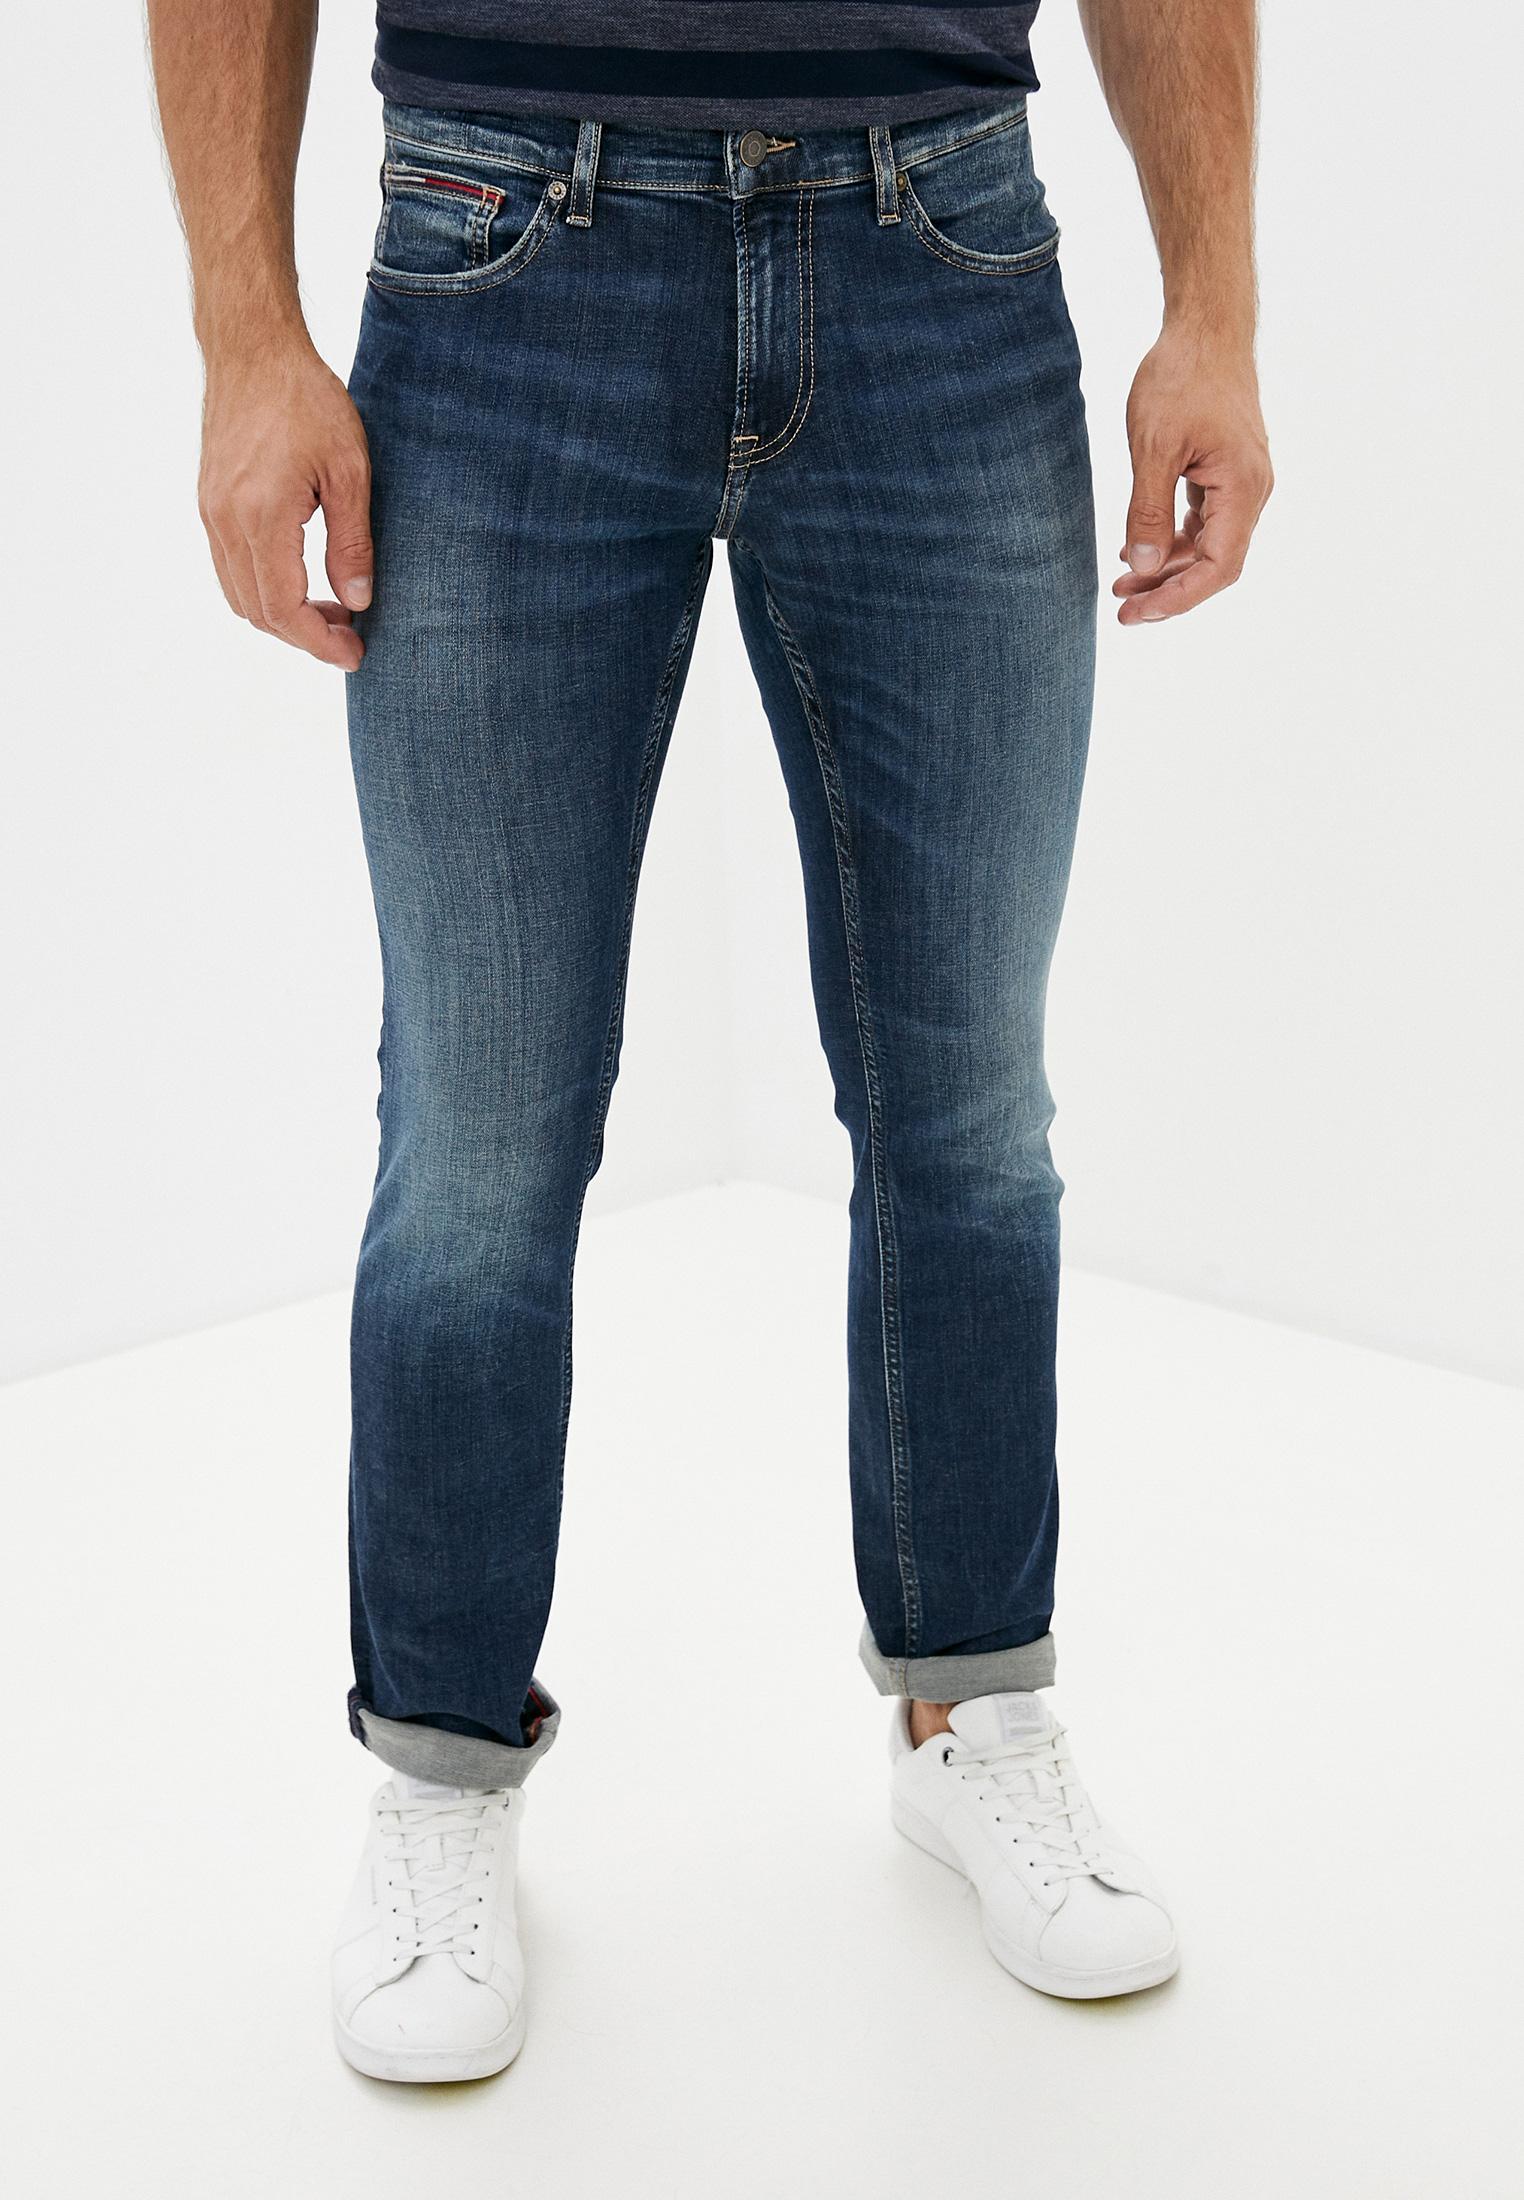 Джинсы Tommy Jeans Scanton за 10 990 ₽. в интернет-магазине Lamoda.ru